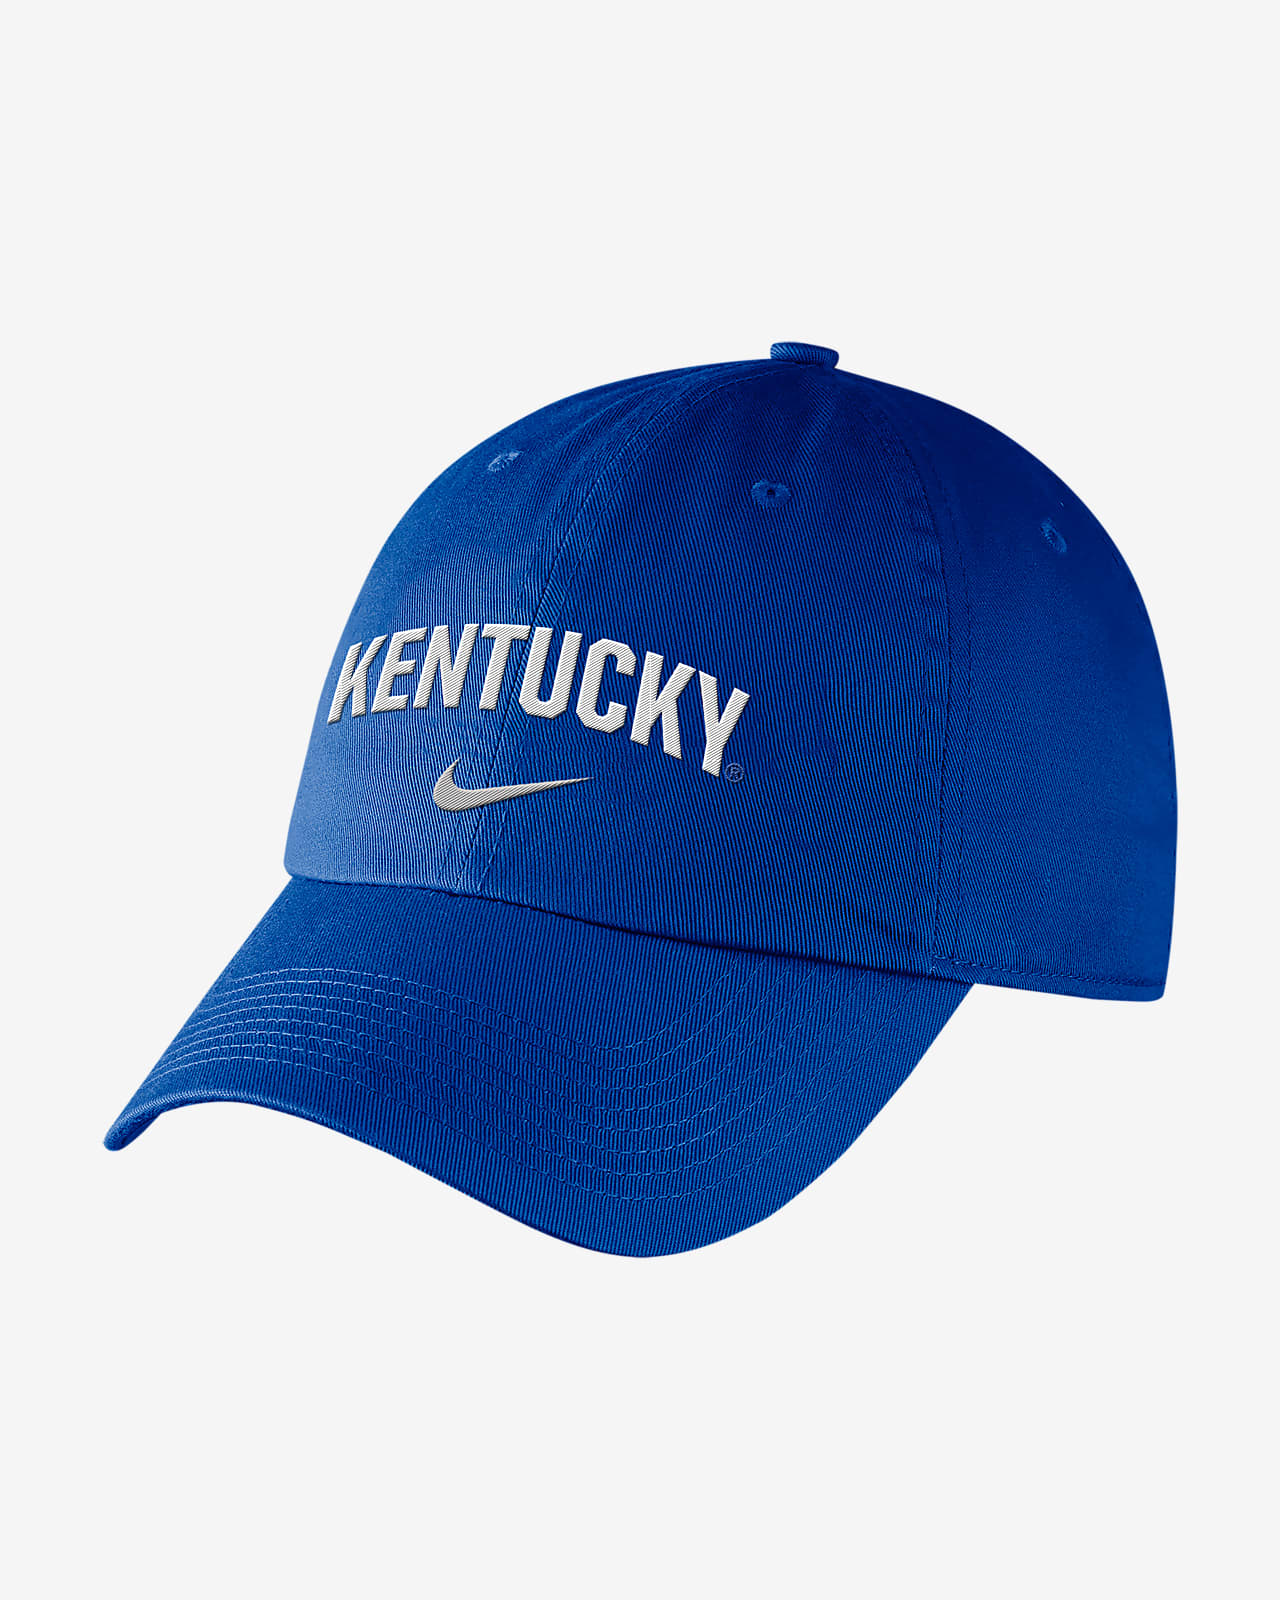 Nike College (Kentucky) Hat